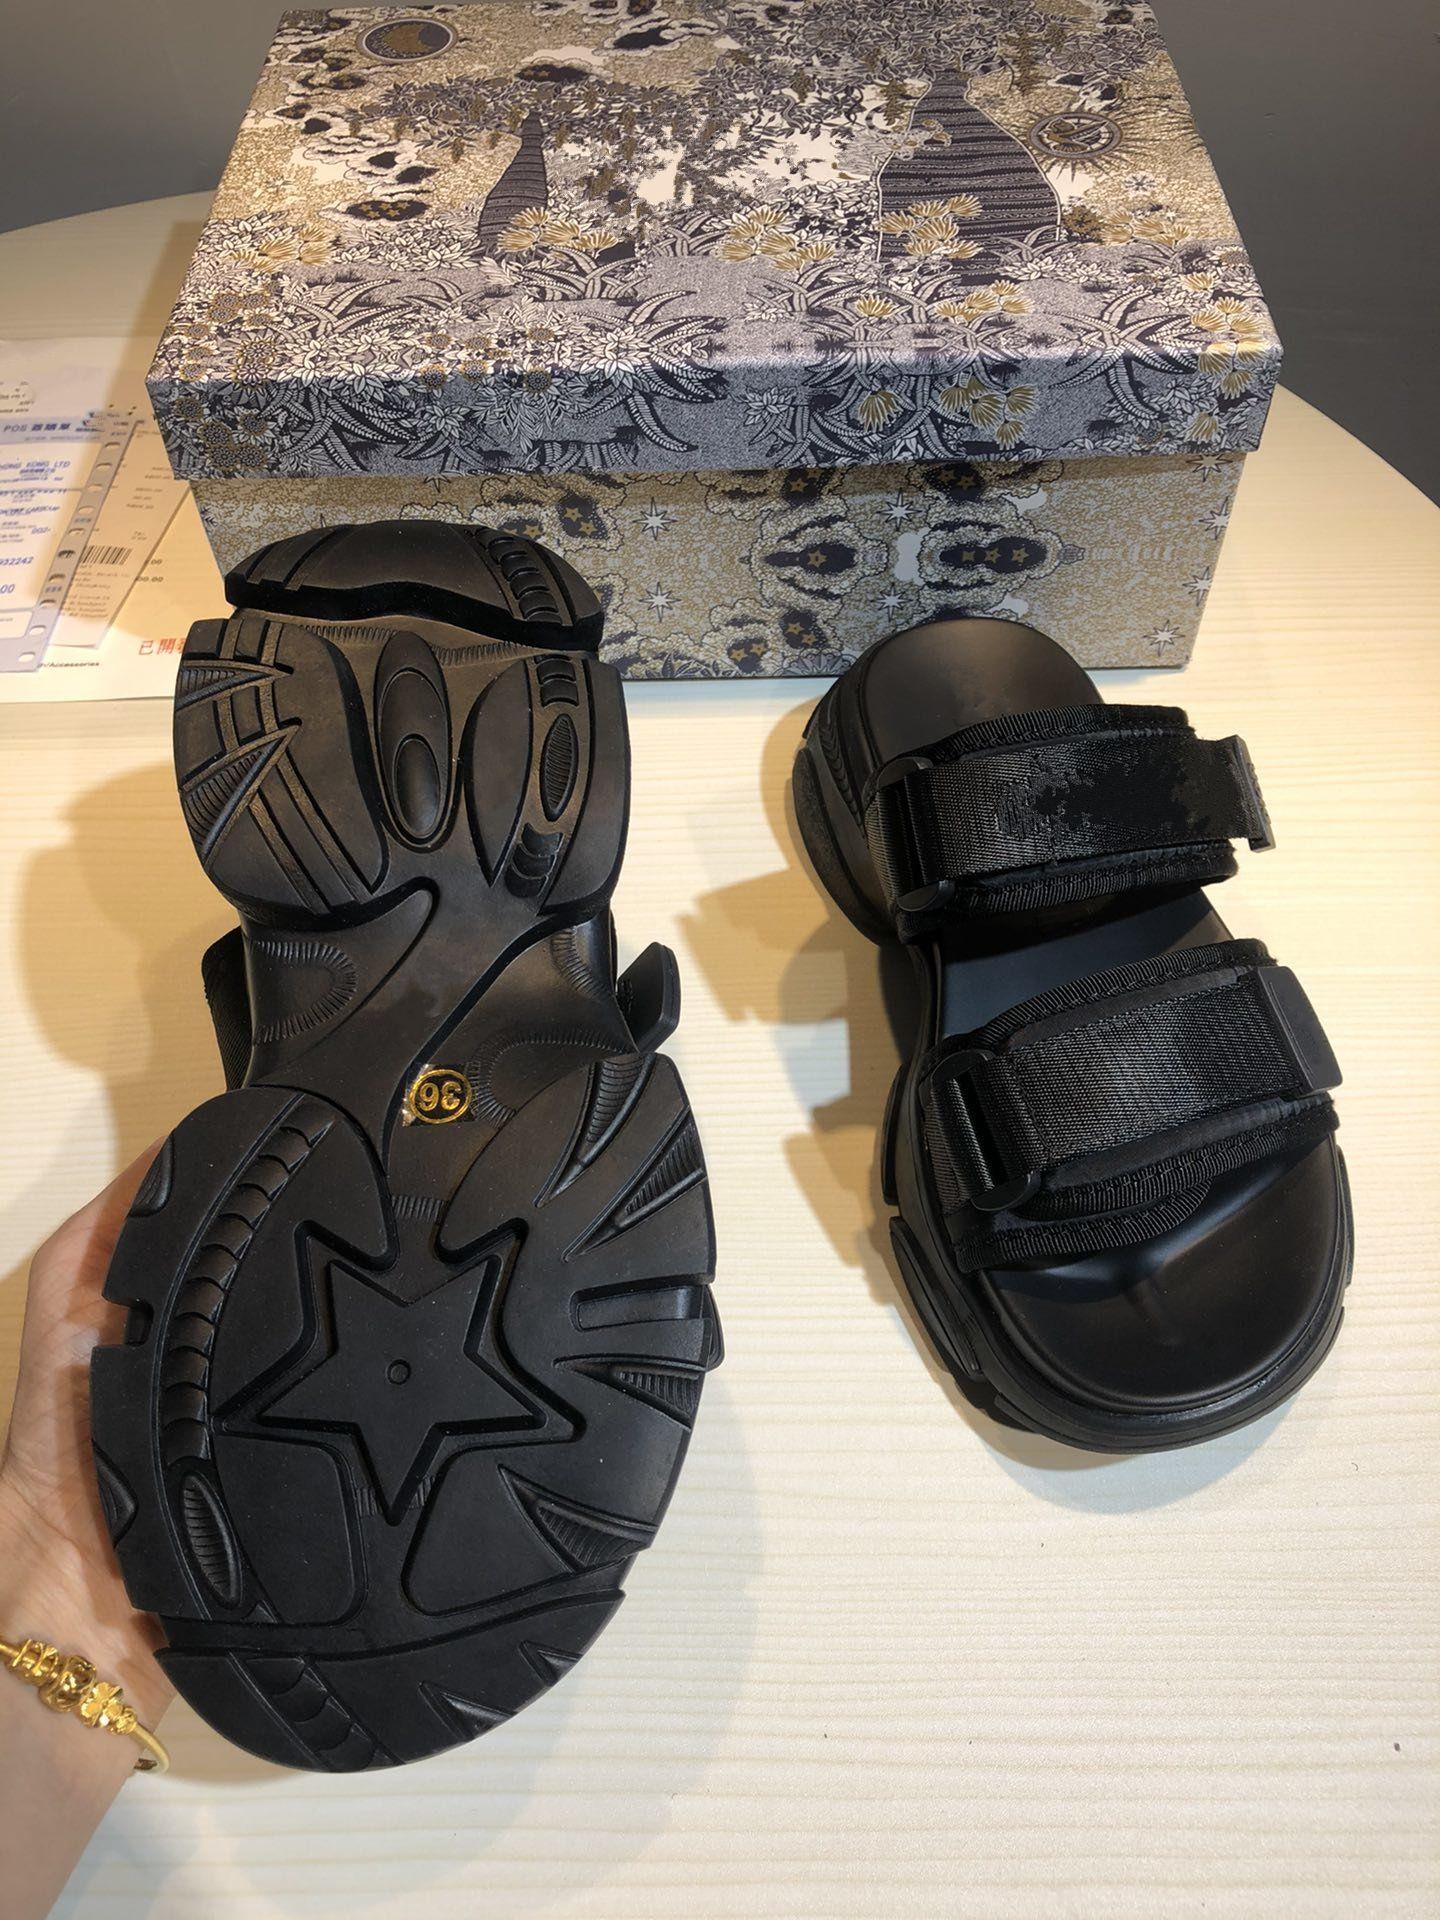 Deportiva blanca camuflaje Técnica Tela mula Plataforma diapositivas sandalias de cuero de lujo de las mujeres calza tamaño de diseño de 35 a 40